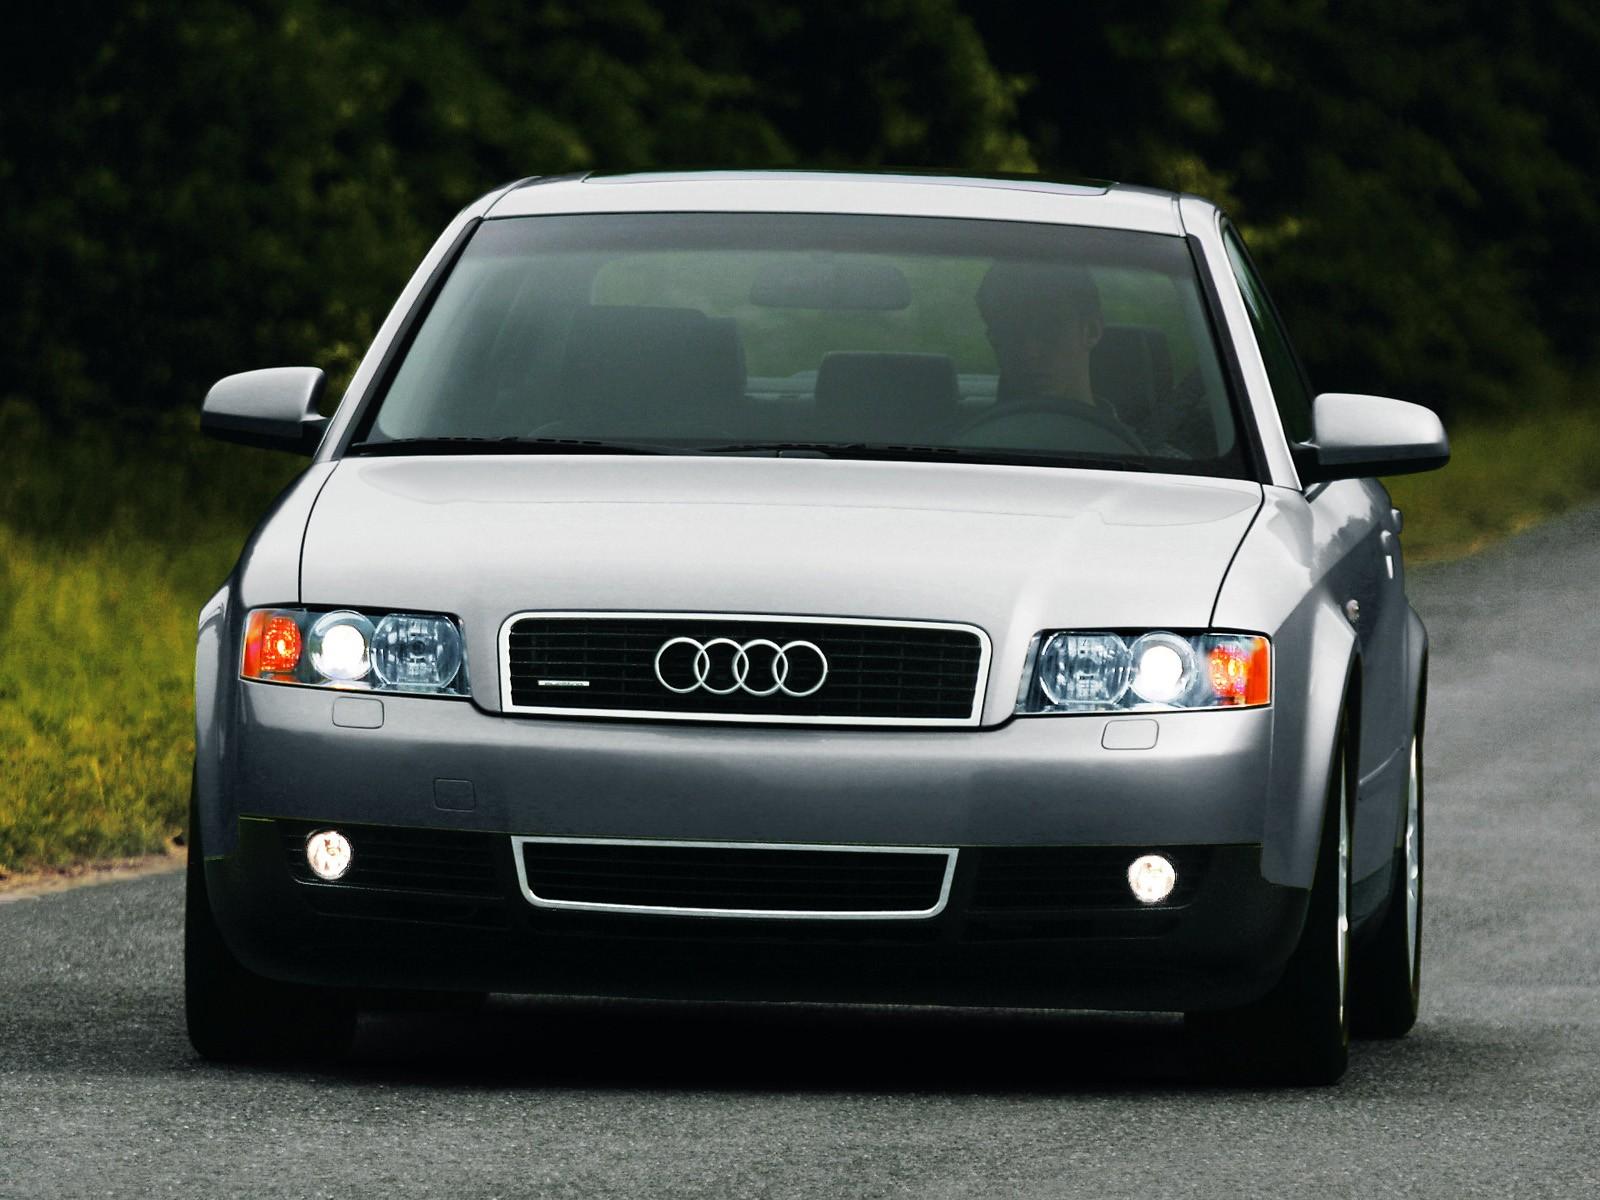 AUDI A4 specs & photos - 2001, 2002, 2003, 2004 - autoevolution